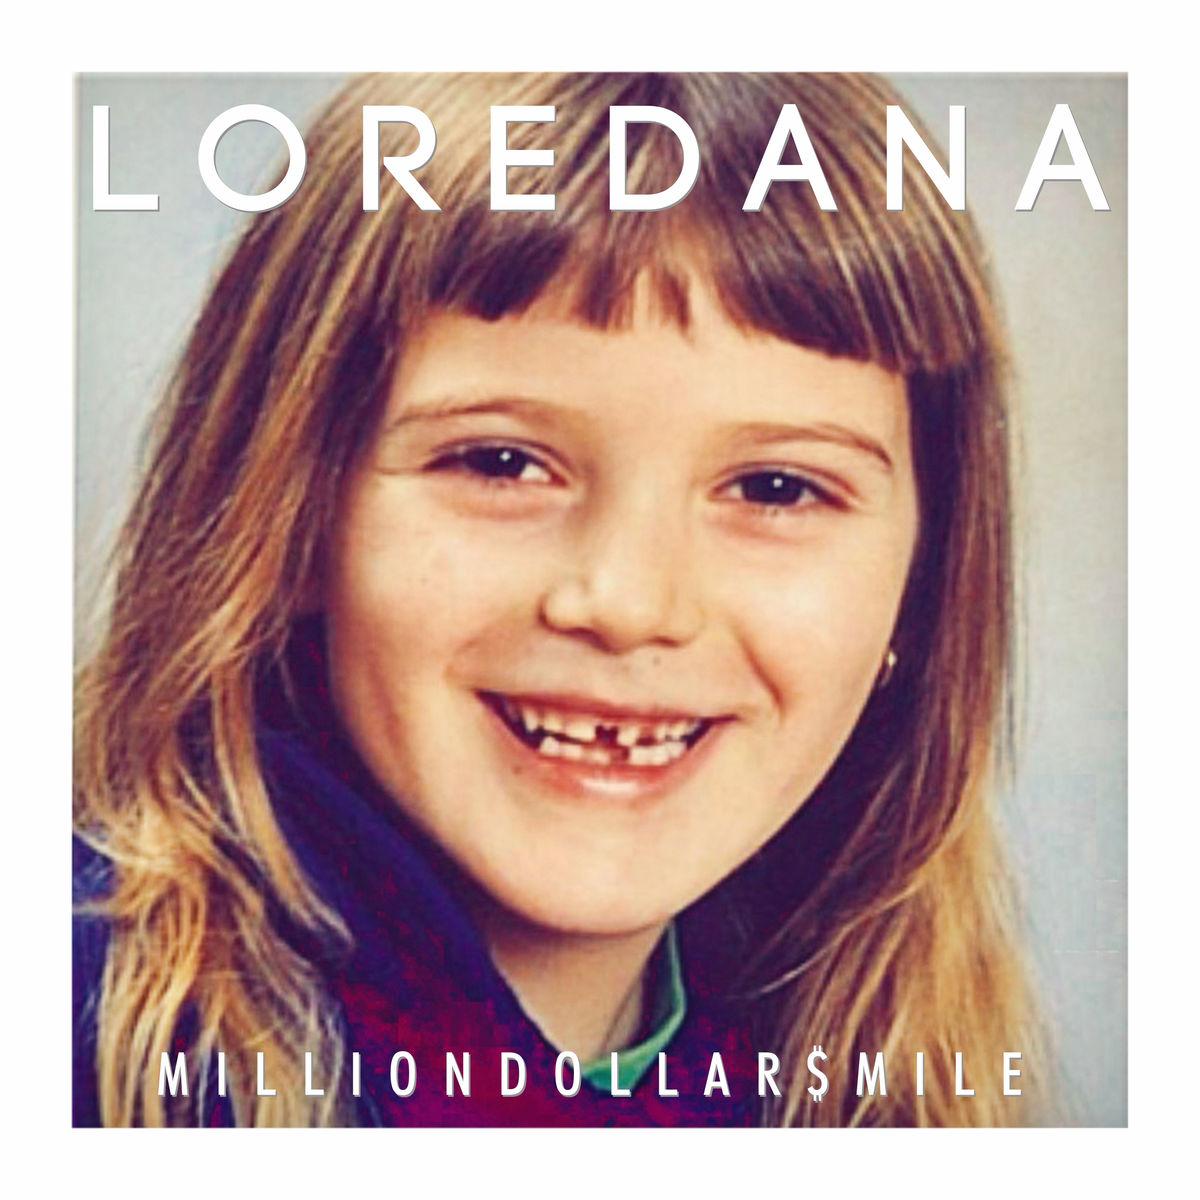 ultratop.be Loredana Sonnenbrille